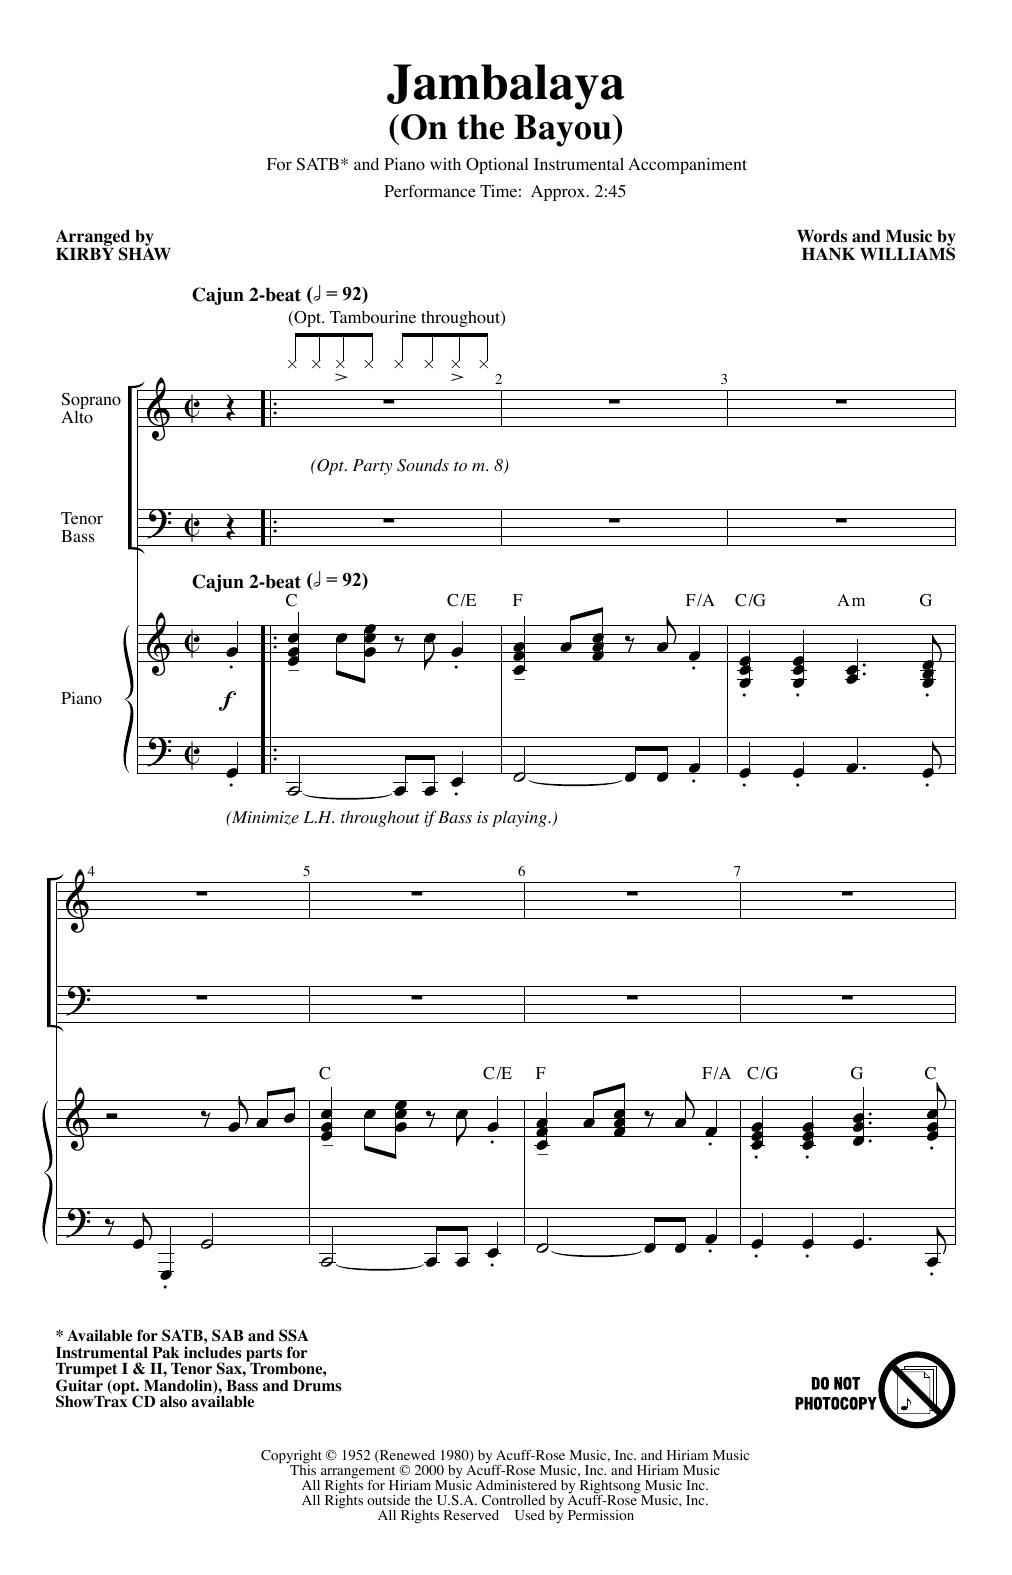 Jambalaya (On The Bayou) (arr. Kirby Shaw) (SATB Choir)